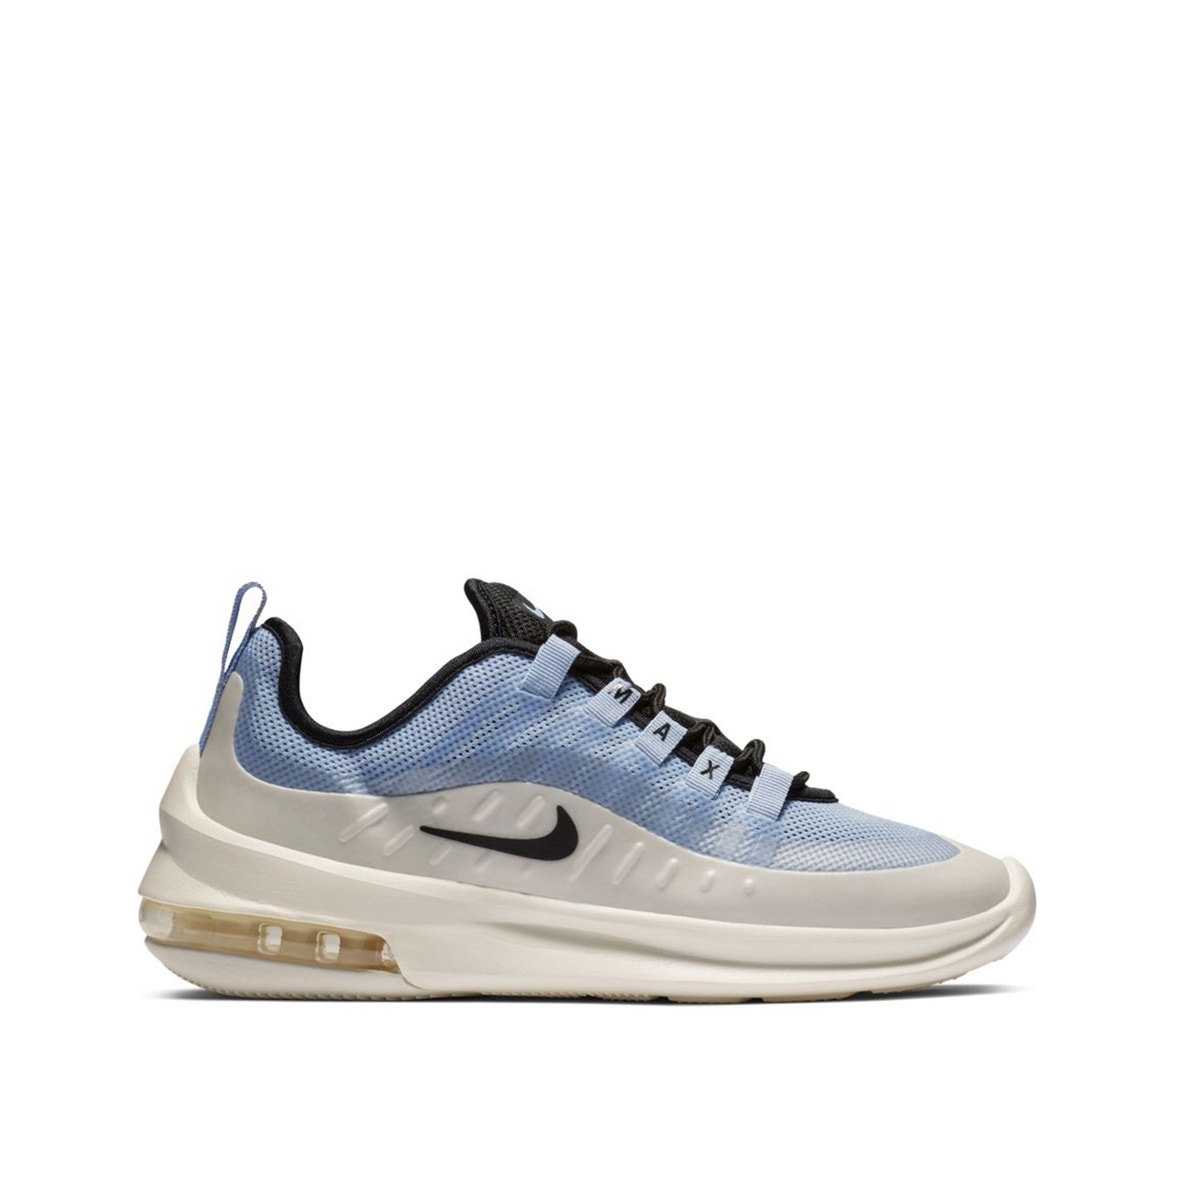 Nike - Αθλητικά παπούτσια, Air Max Axis 350148288 - 923